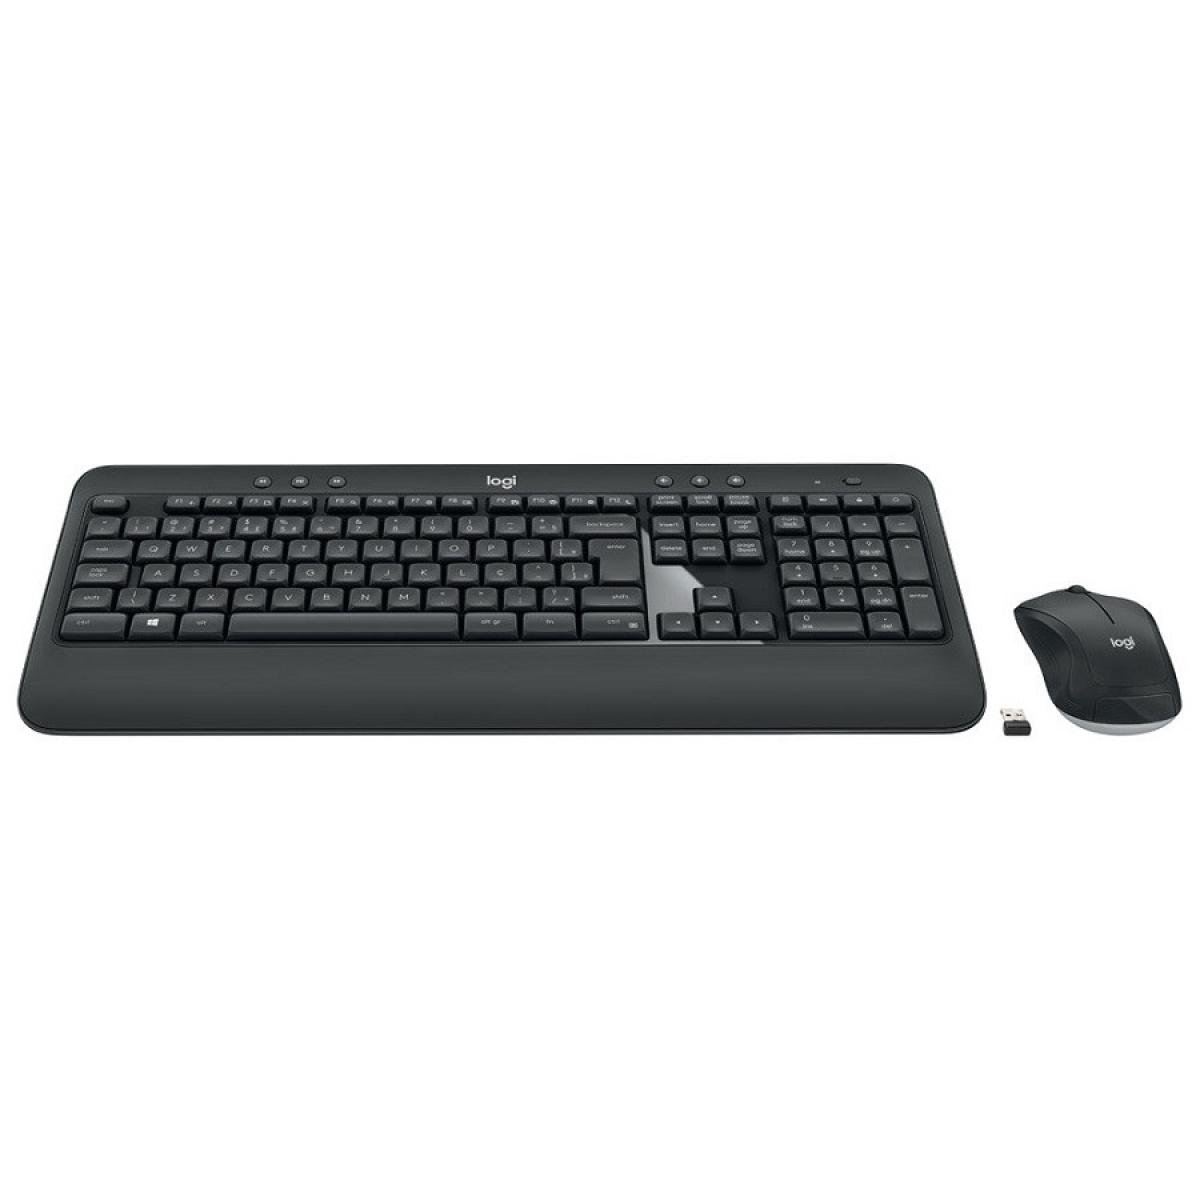 Combo Teclado e Mouse Logitech MK540 Advanced Sem Fio ABNT2 Black, 920-008674